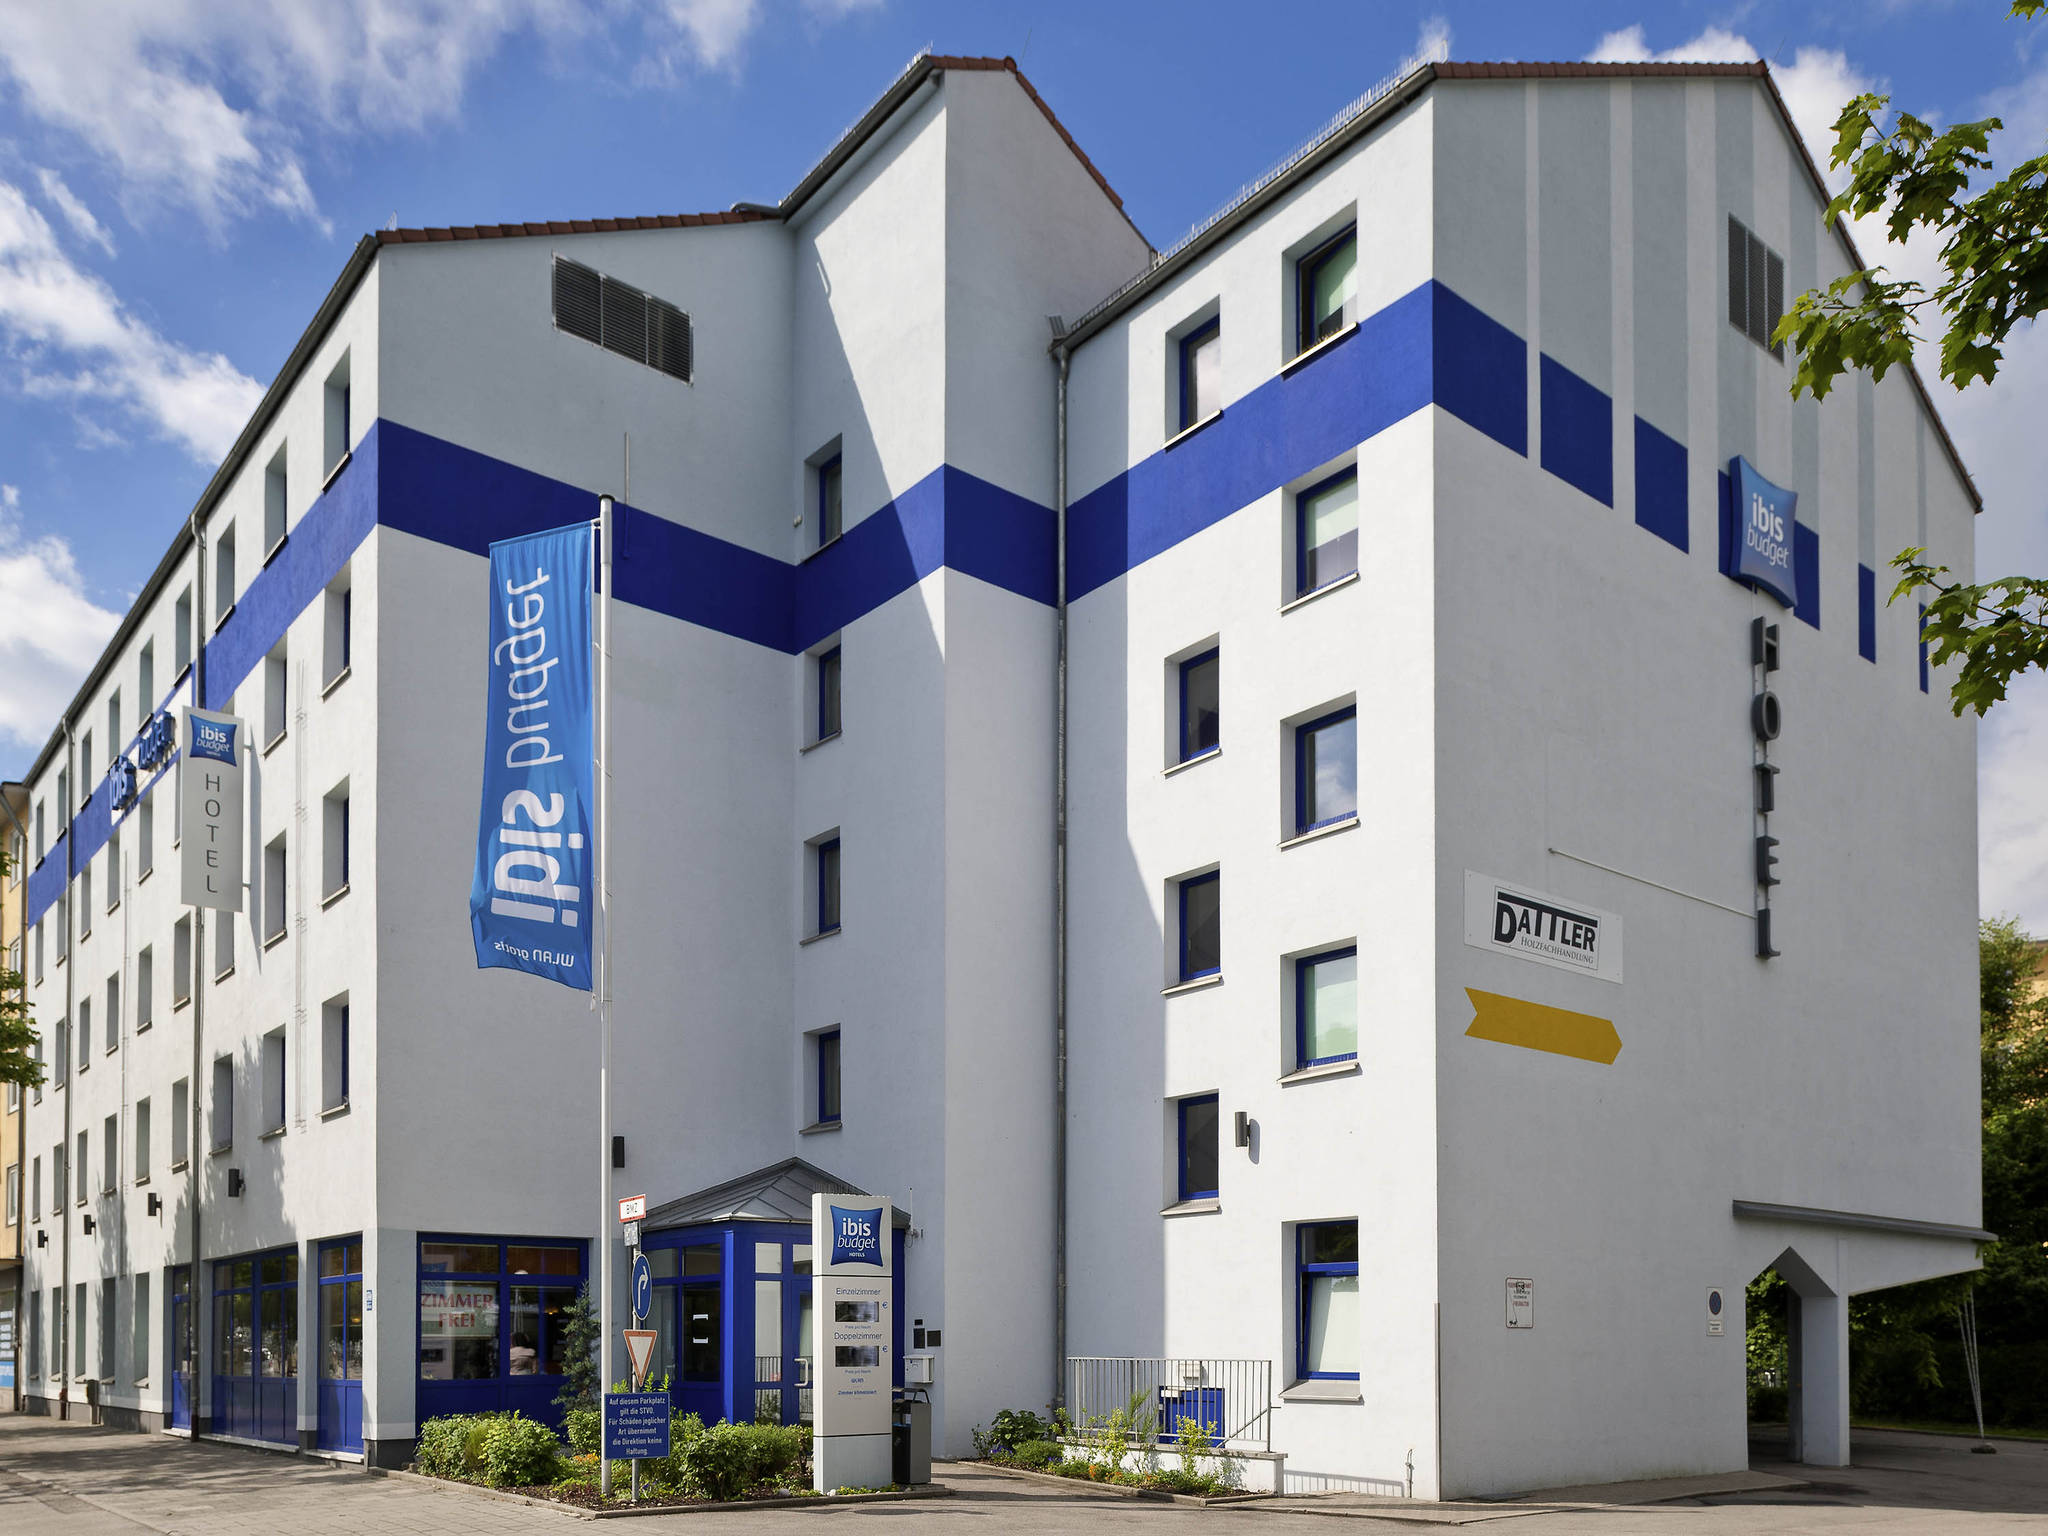 Humboldtstr München hotel ibis budget munich city south book now free wifi